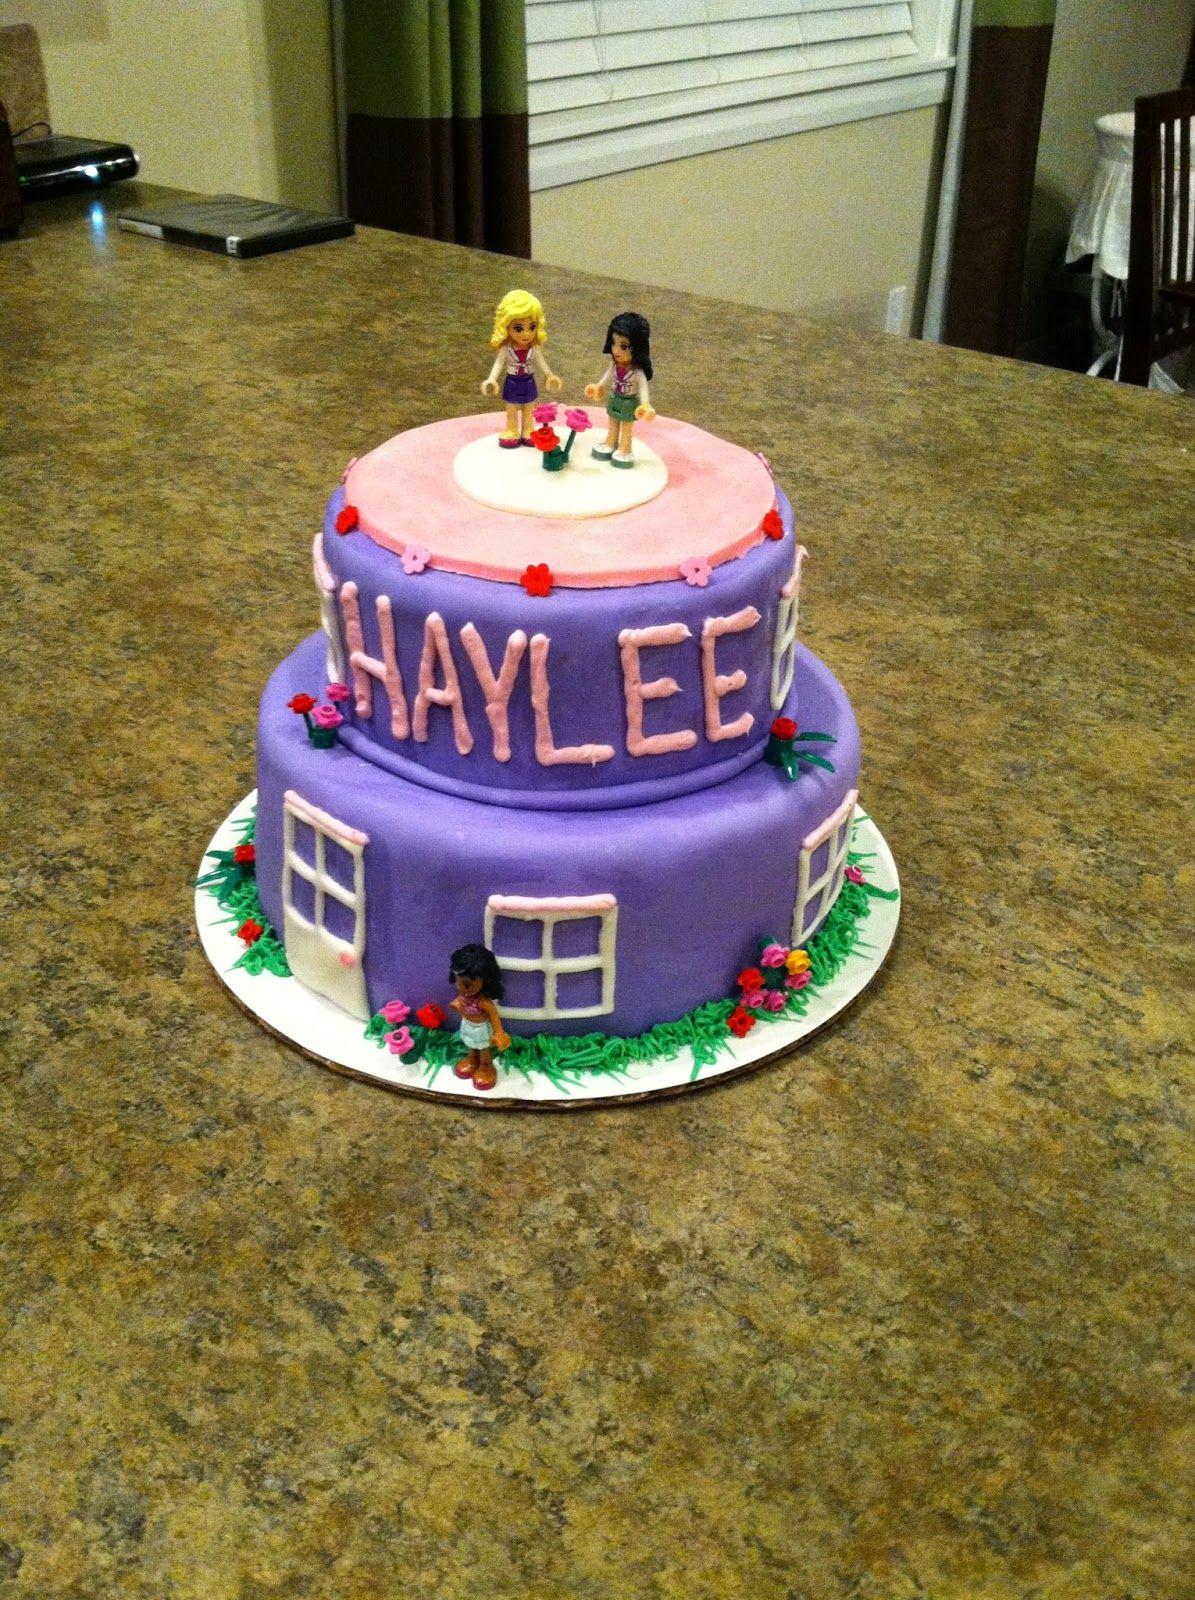 Lego Friends Cake Fondant 8 Years Old Lego Friends